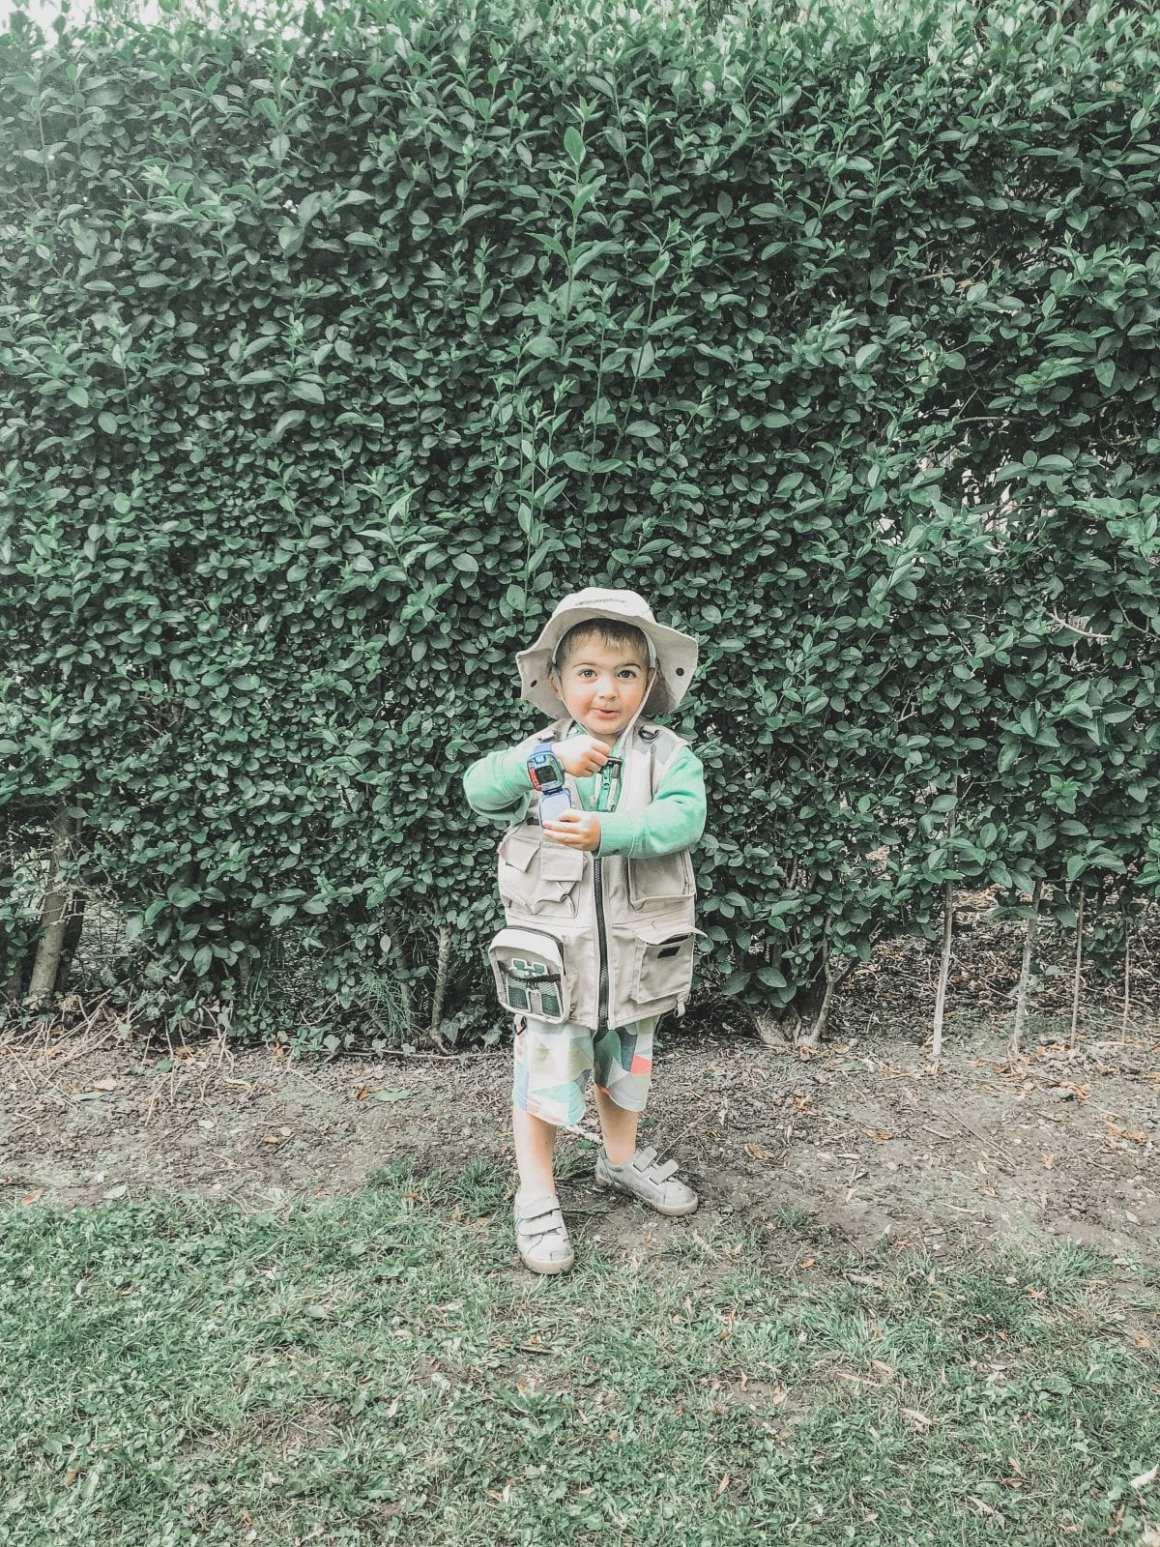 Andy's dinosaur adventure costume